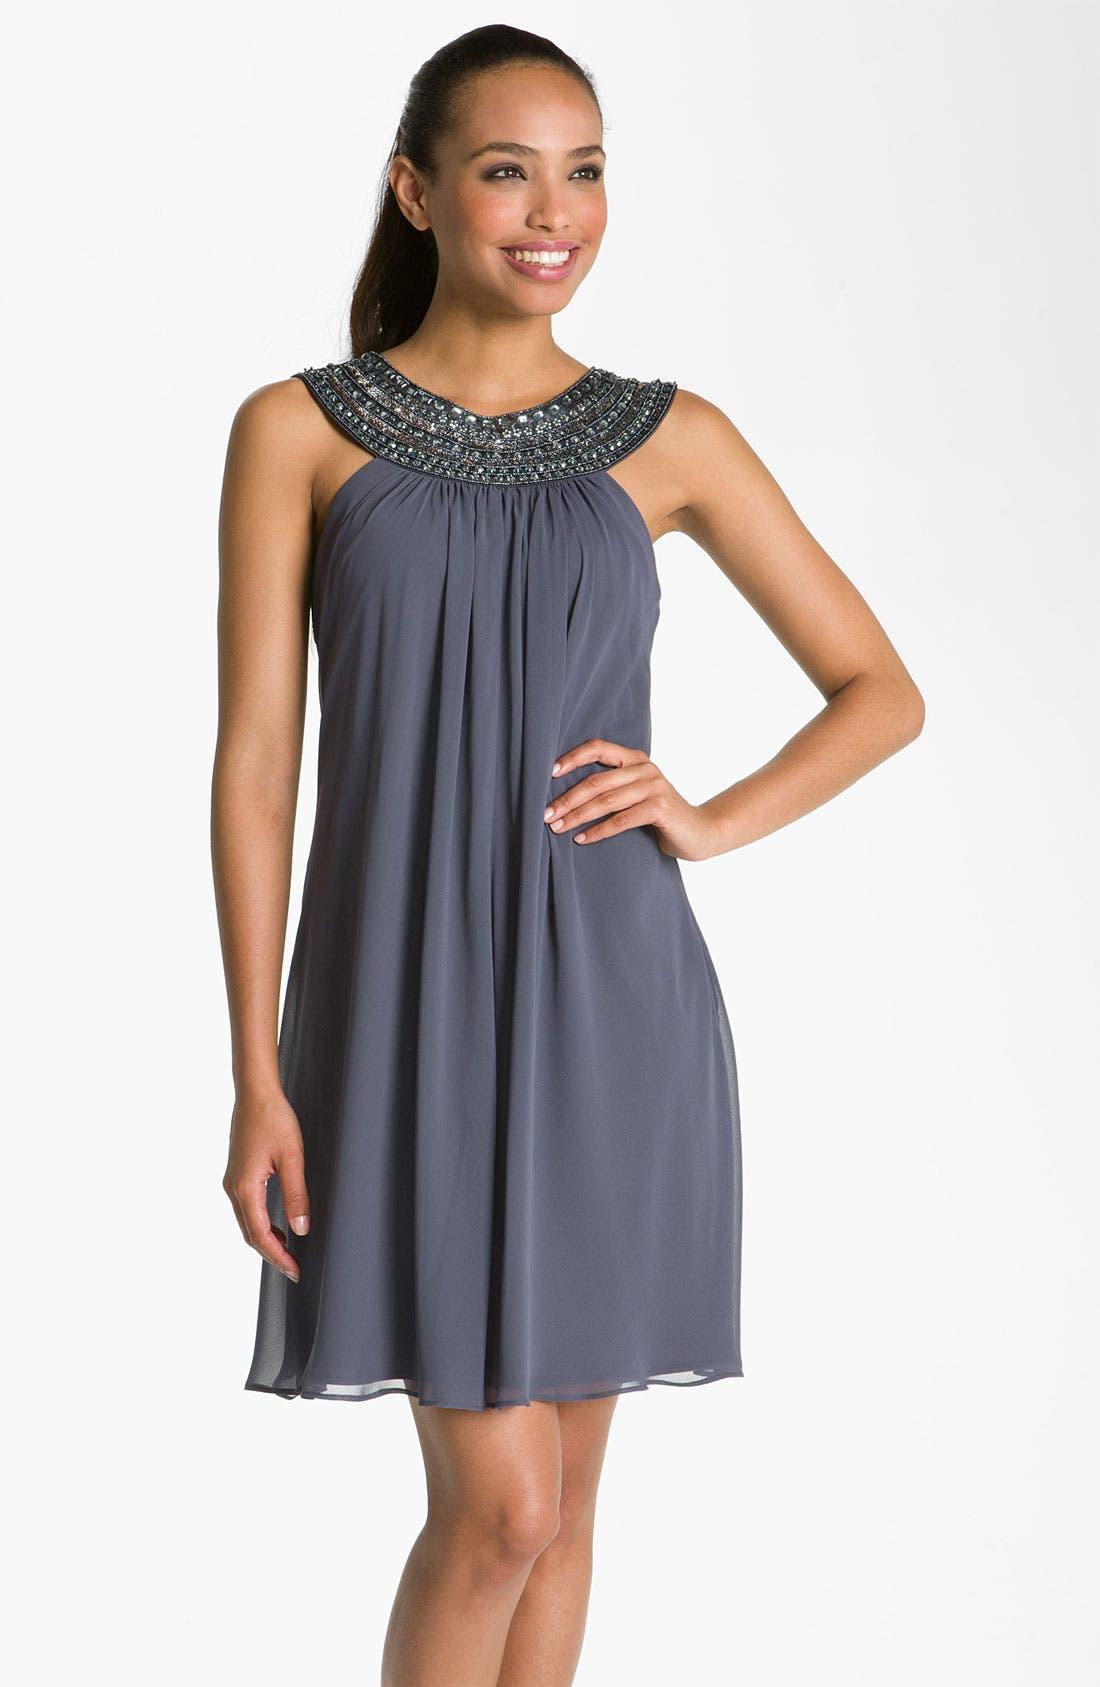 Alternate Image 1 Selected - JS Boutique Beaded Chiffon Trapeze Dress